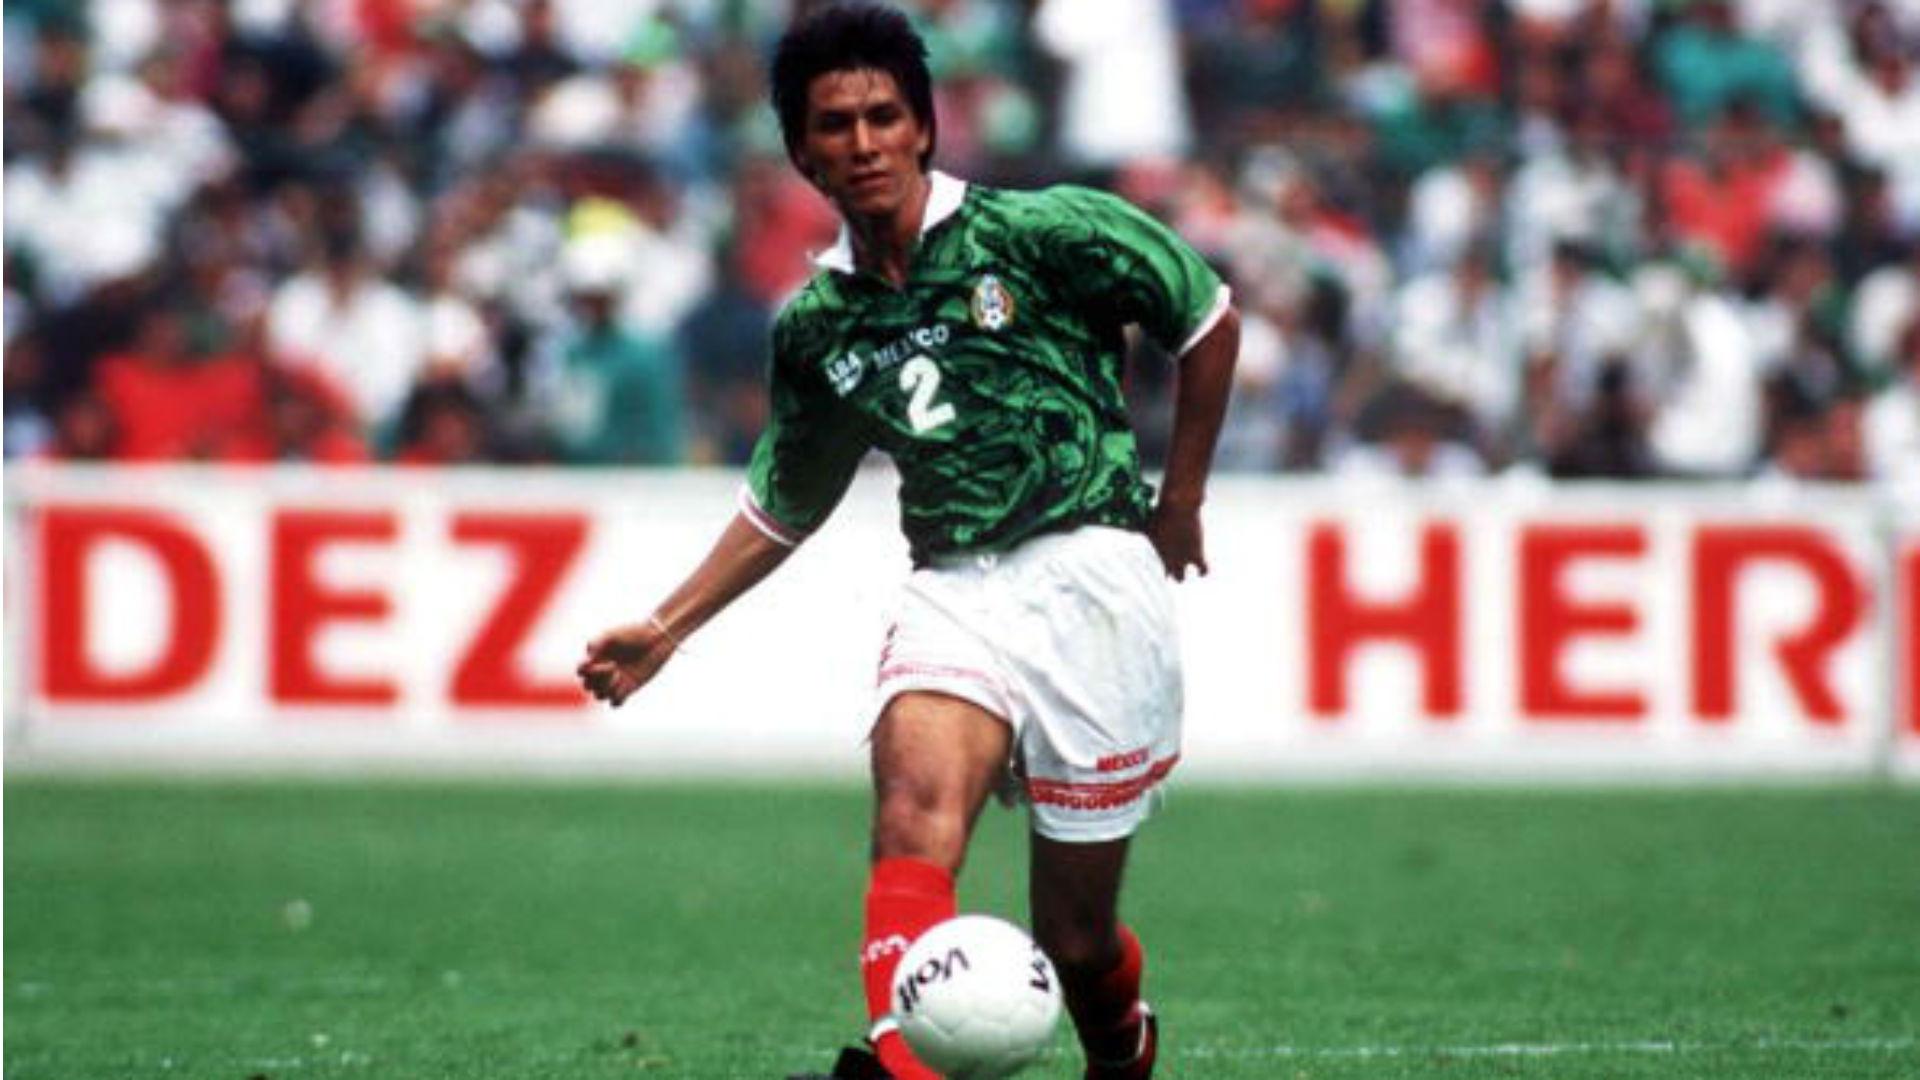 México XI Ideal Copa América Claudio Suárez